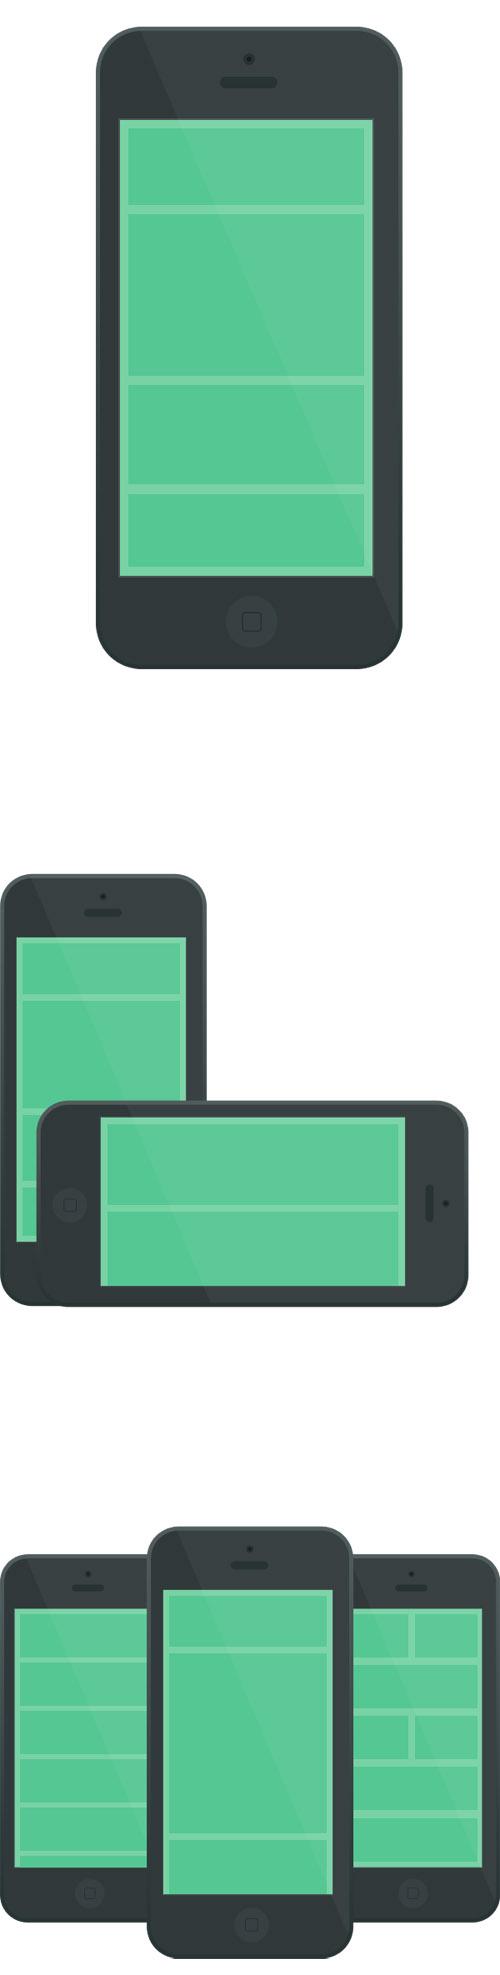 Flat Elements for Web UI Design-33